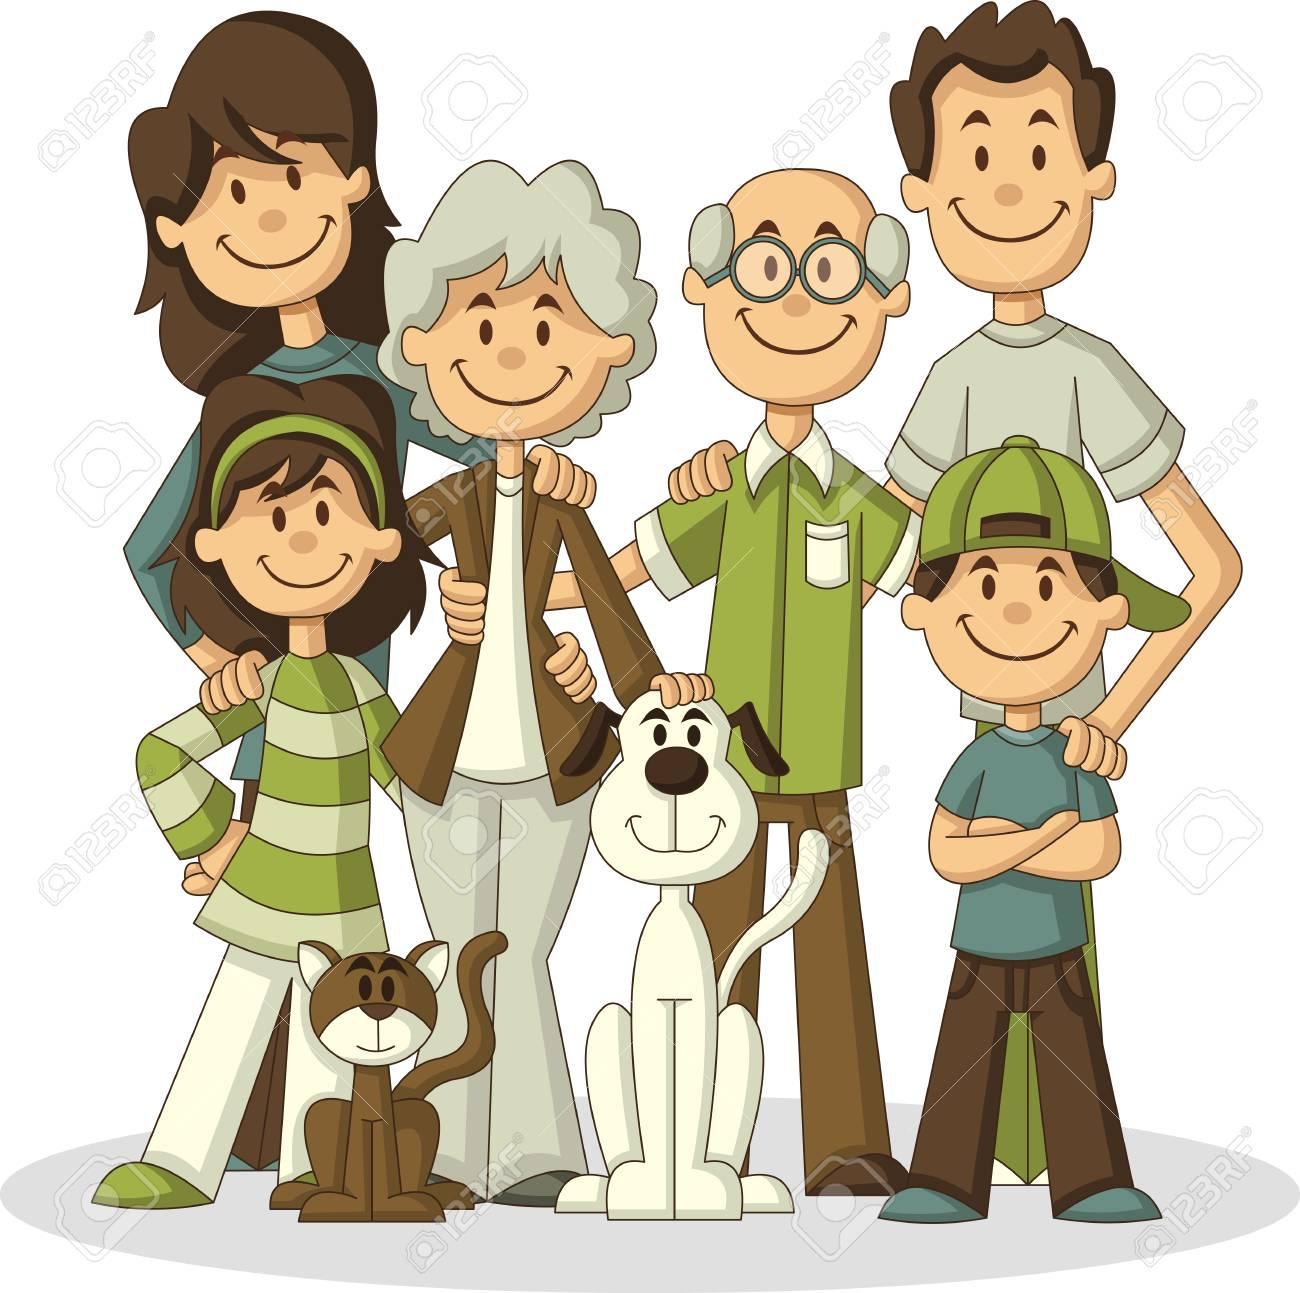 Colorful happy cartoon People. Big family. - 93077738